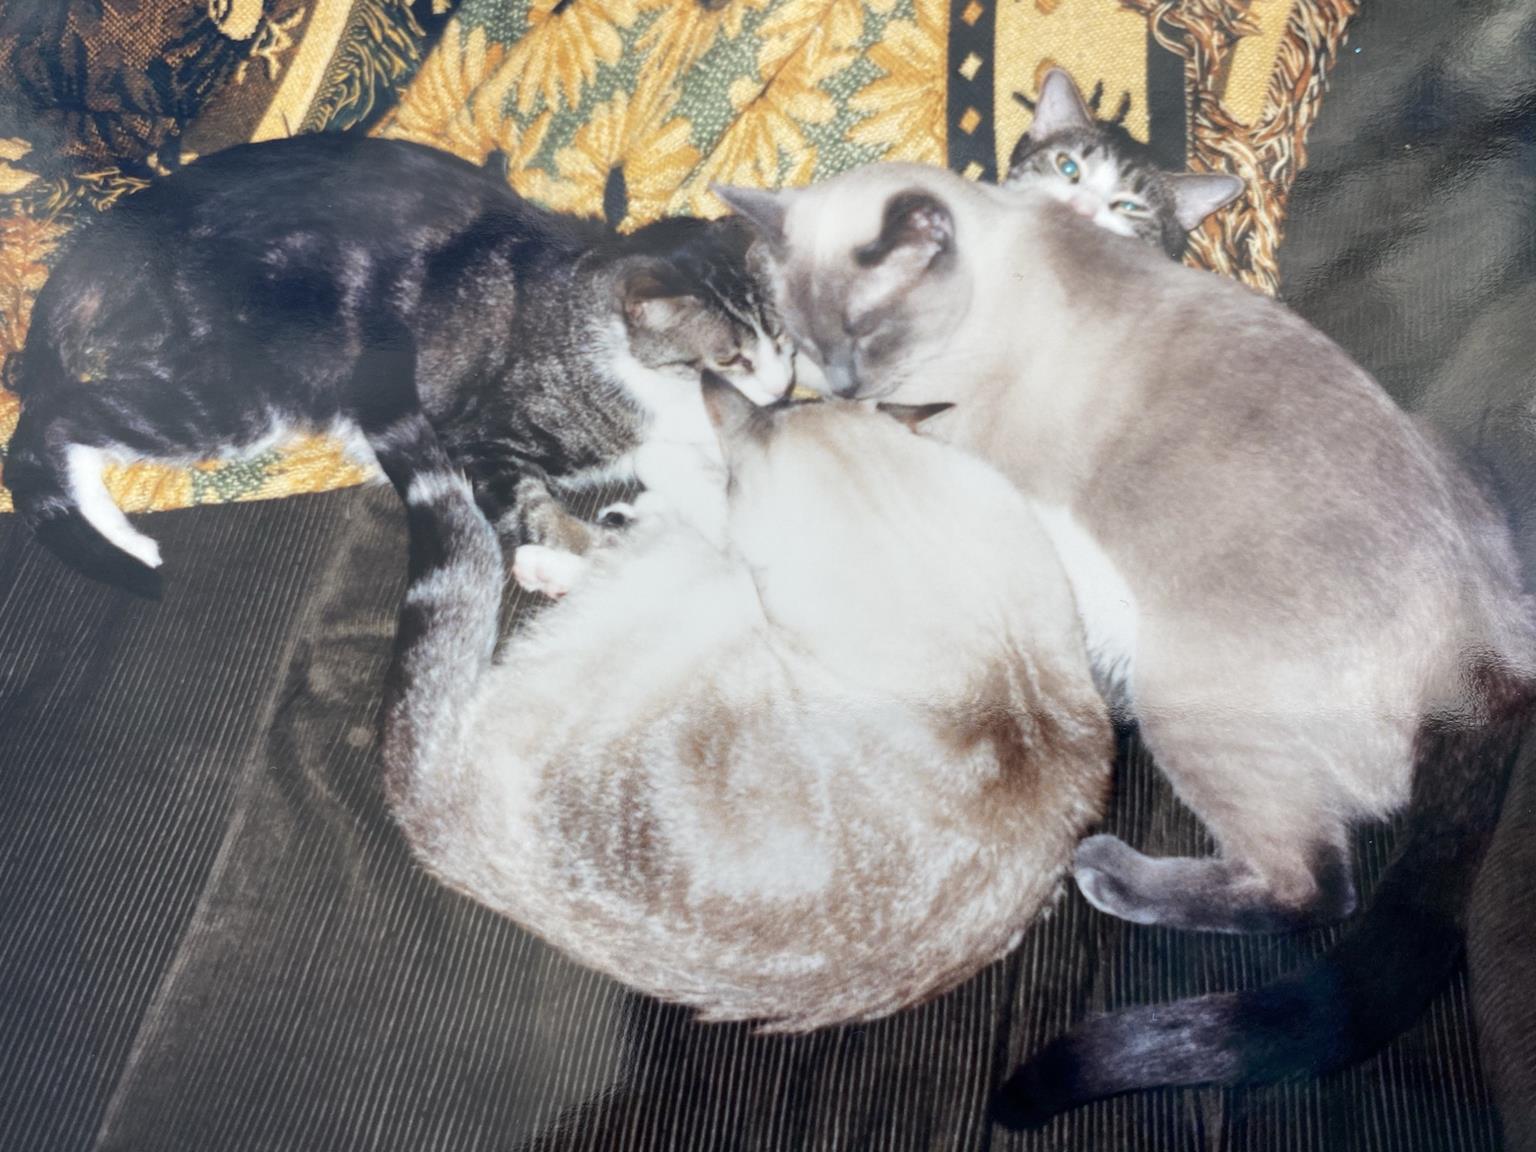 Festus being squished by Shadow, Lynx & Mercury.